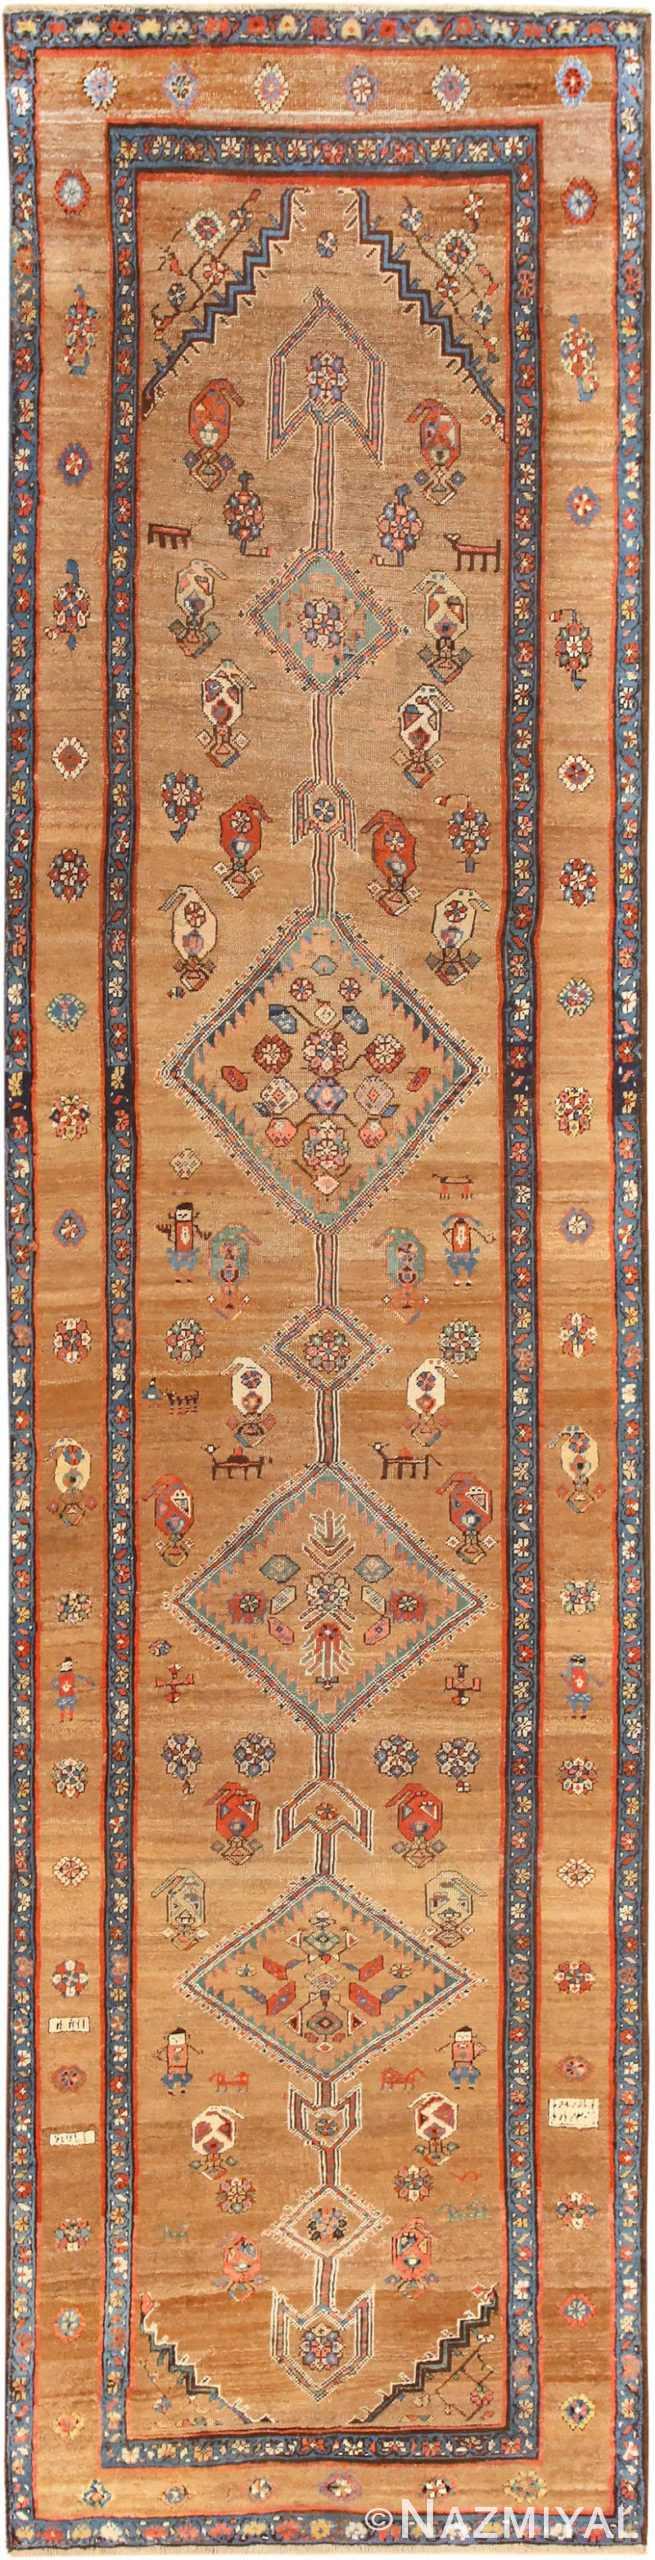 Tribal Antique Persian Serab Runner Rug 48807 Nazmiyal